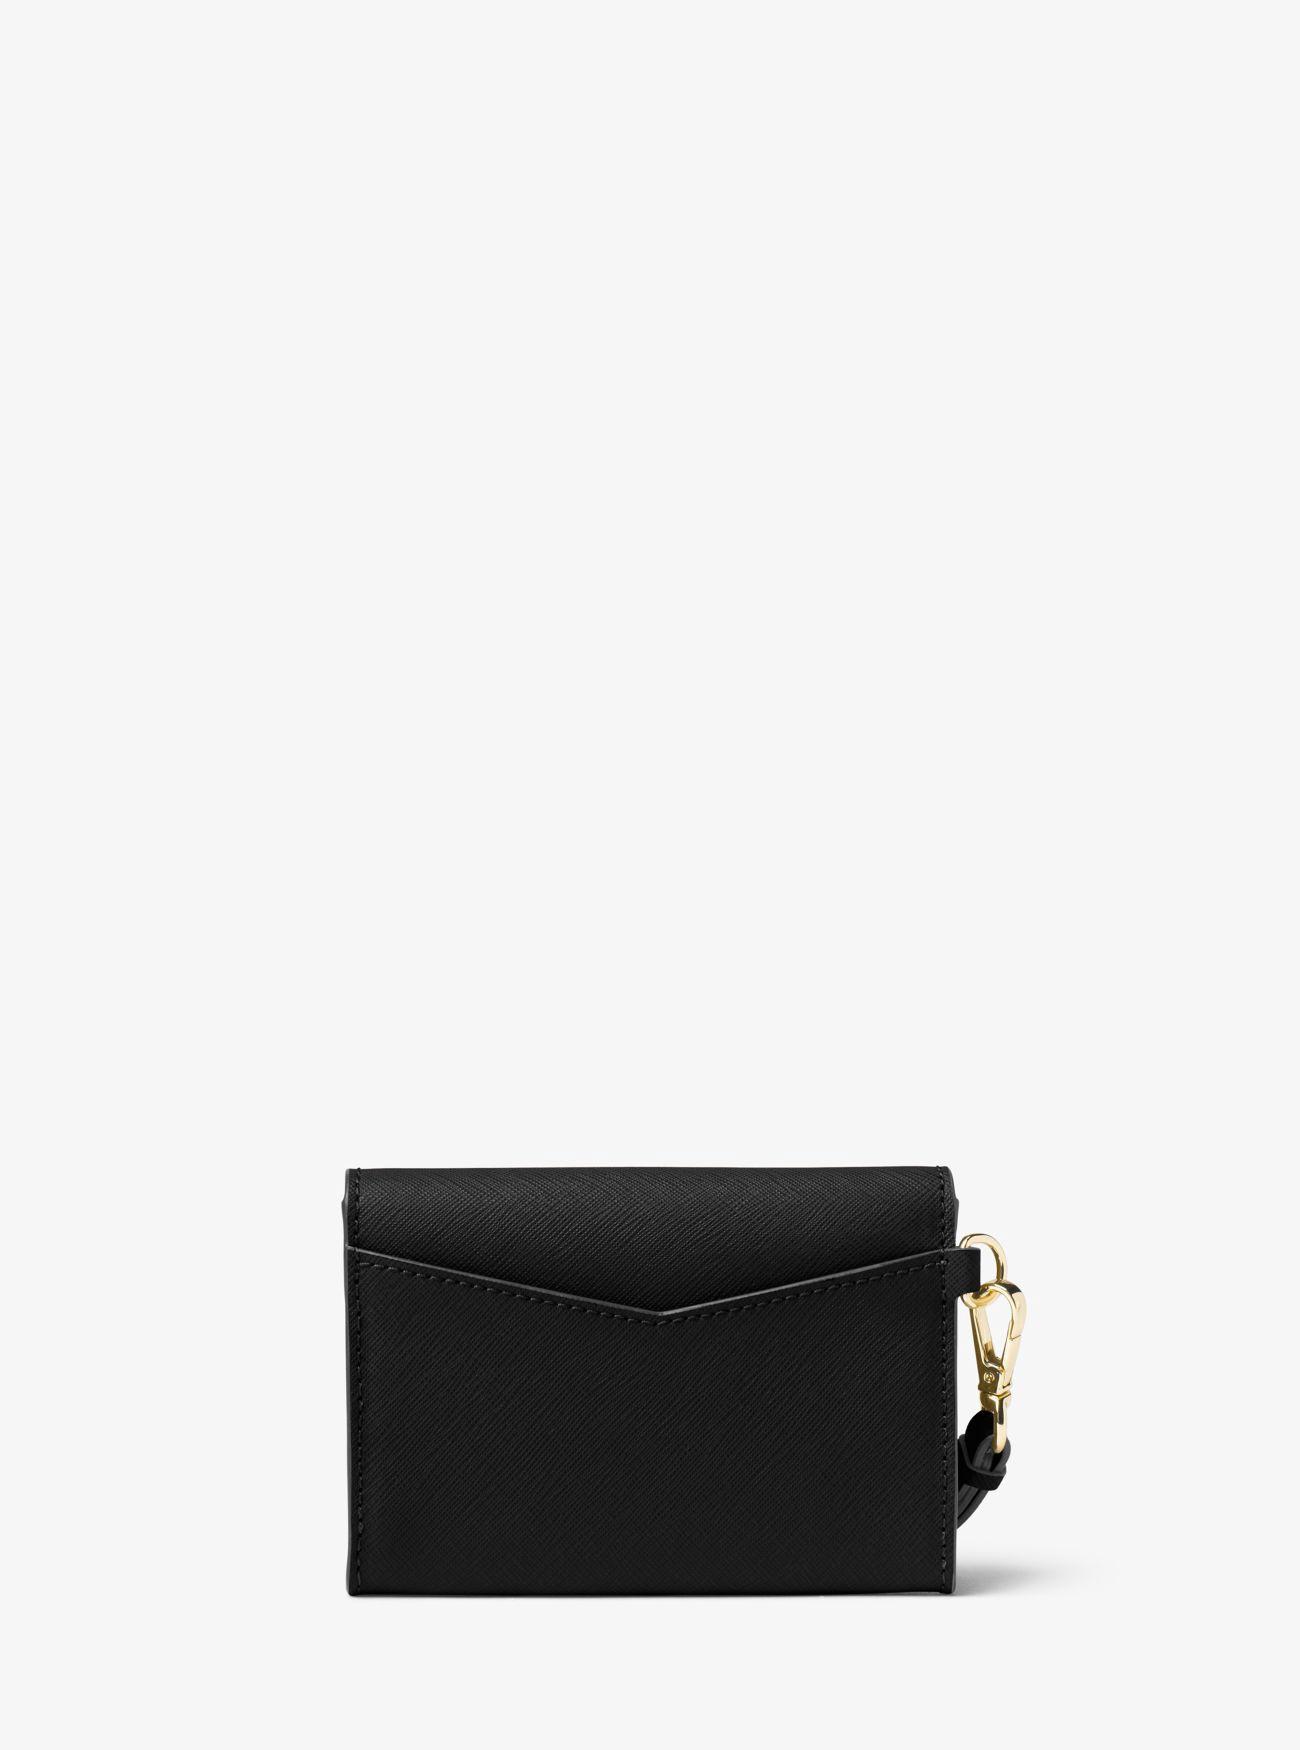 d4d65cfa72fd Michael Kors Honey Medium Leather Wristlet In Black | ModeSens